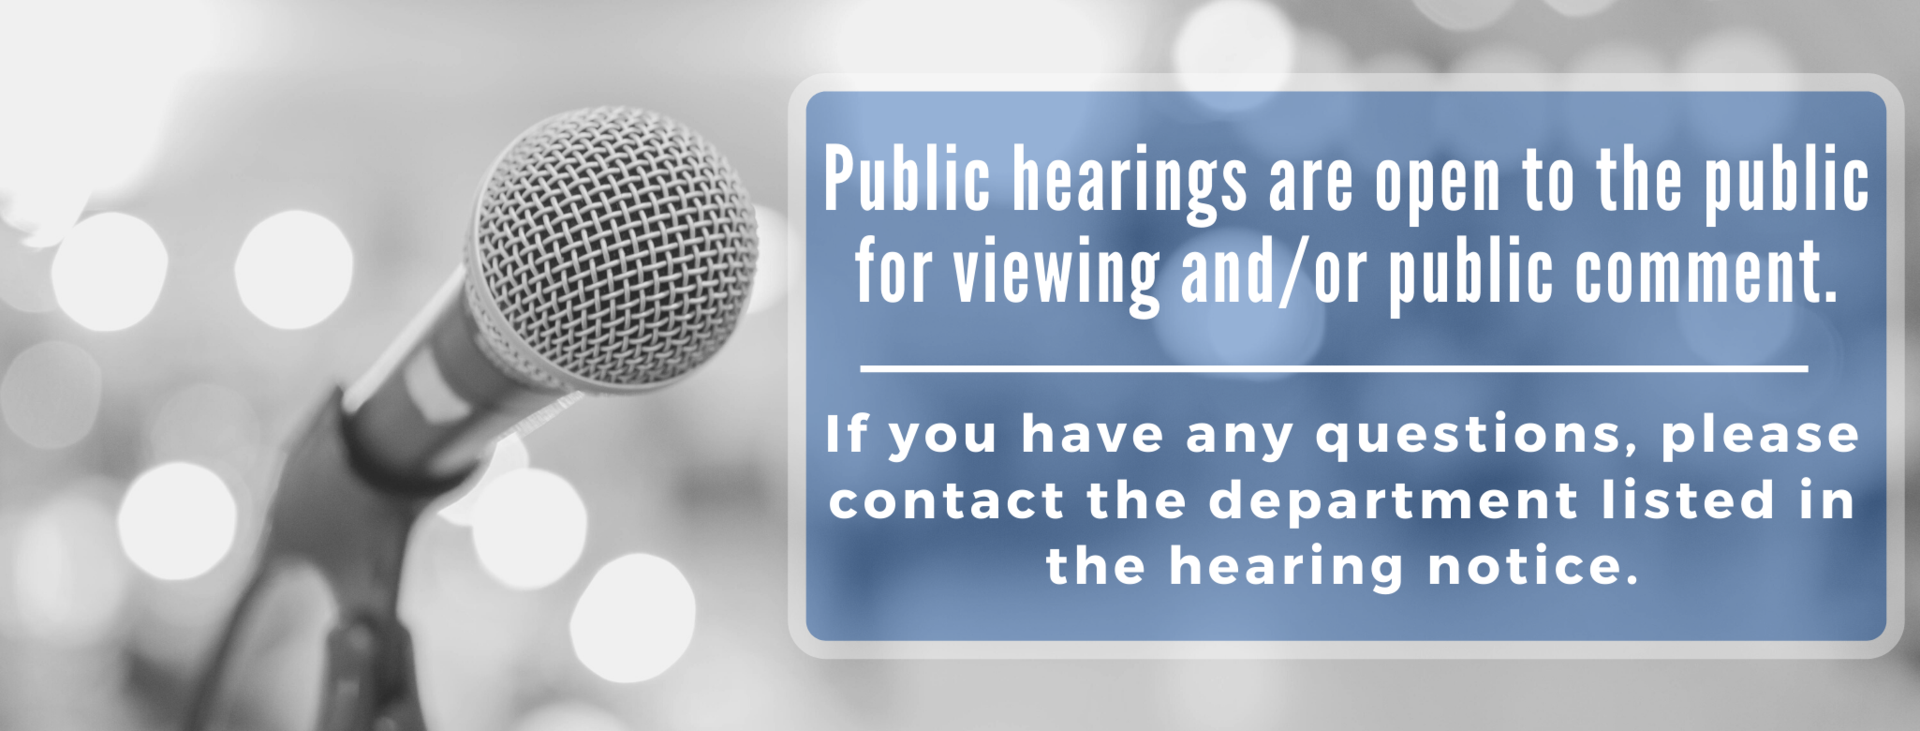 Public Hearing Notice Image